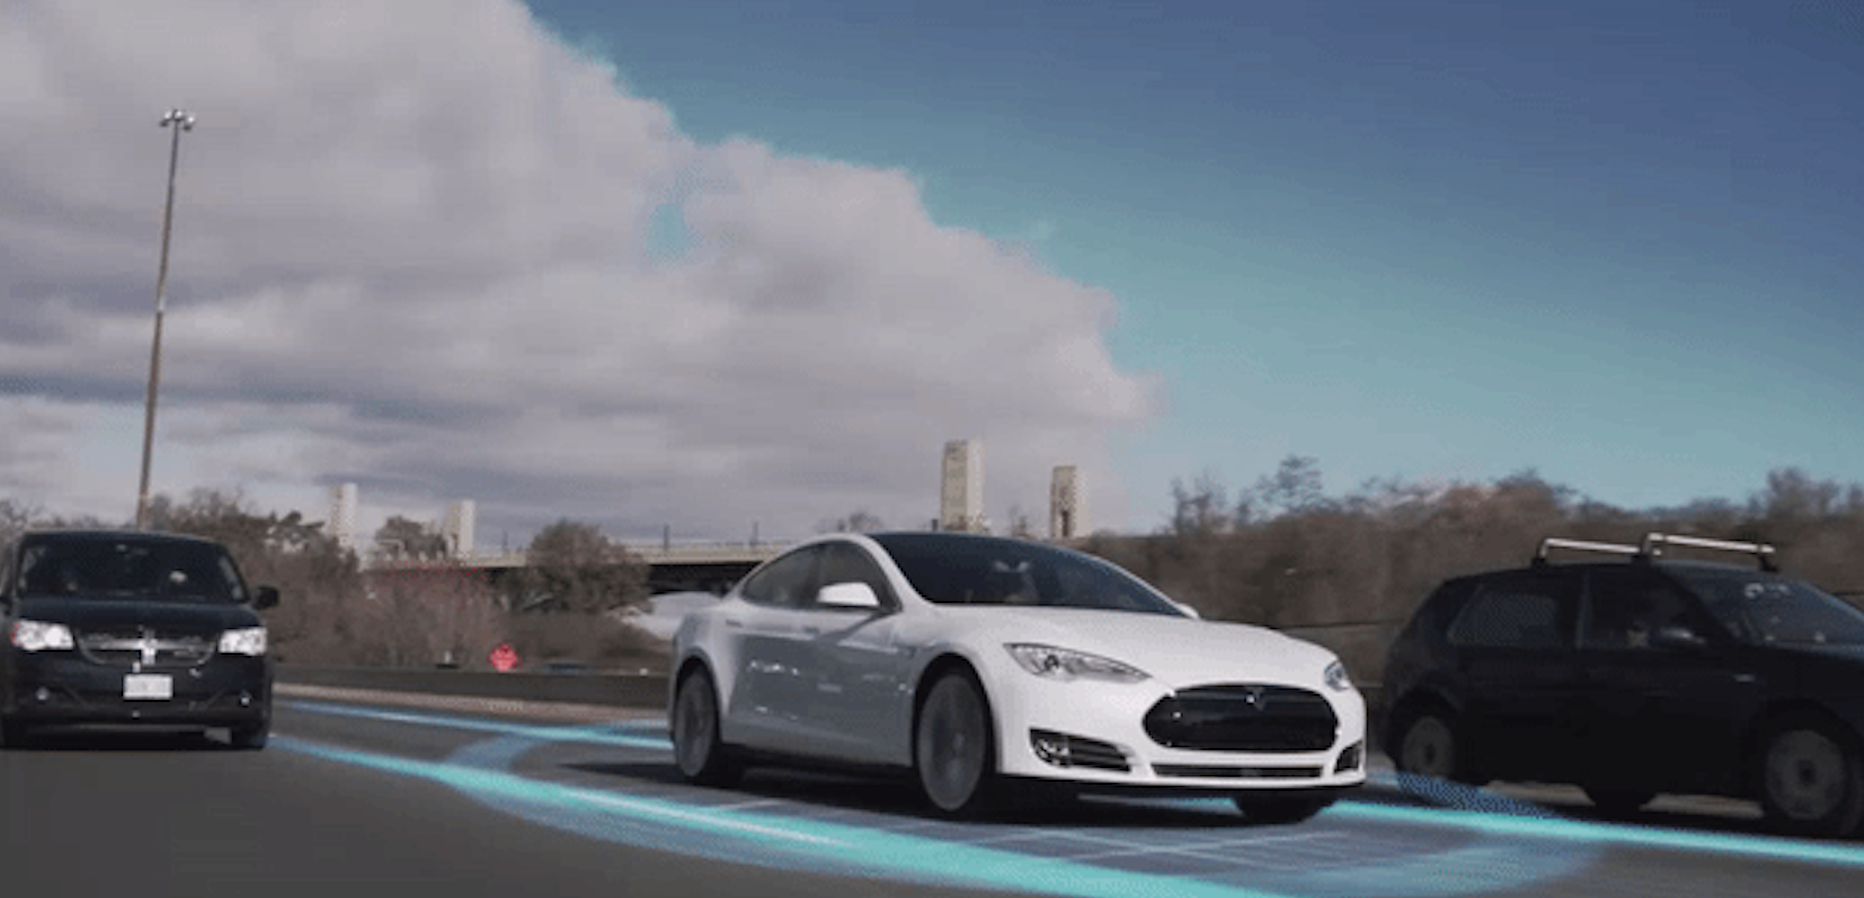 11 New Tesla Autopilot 2019 History for Tesla Autopilot 2019